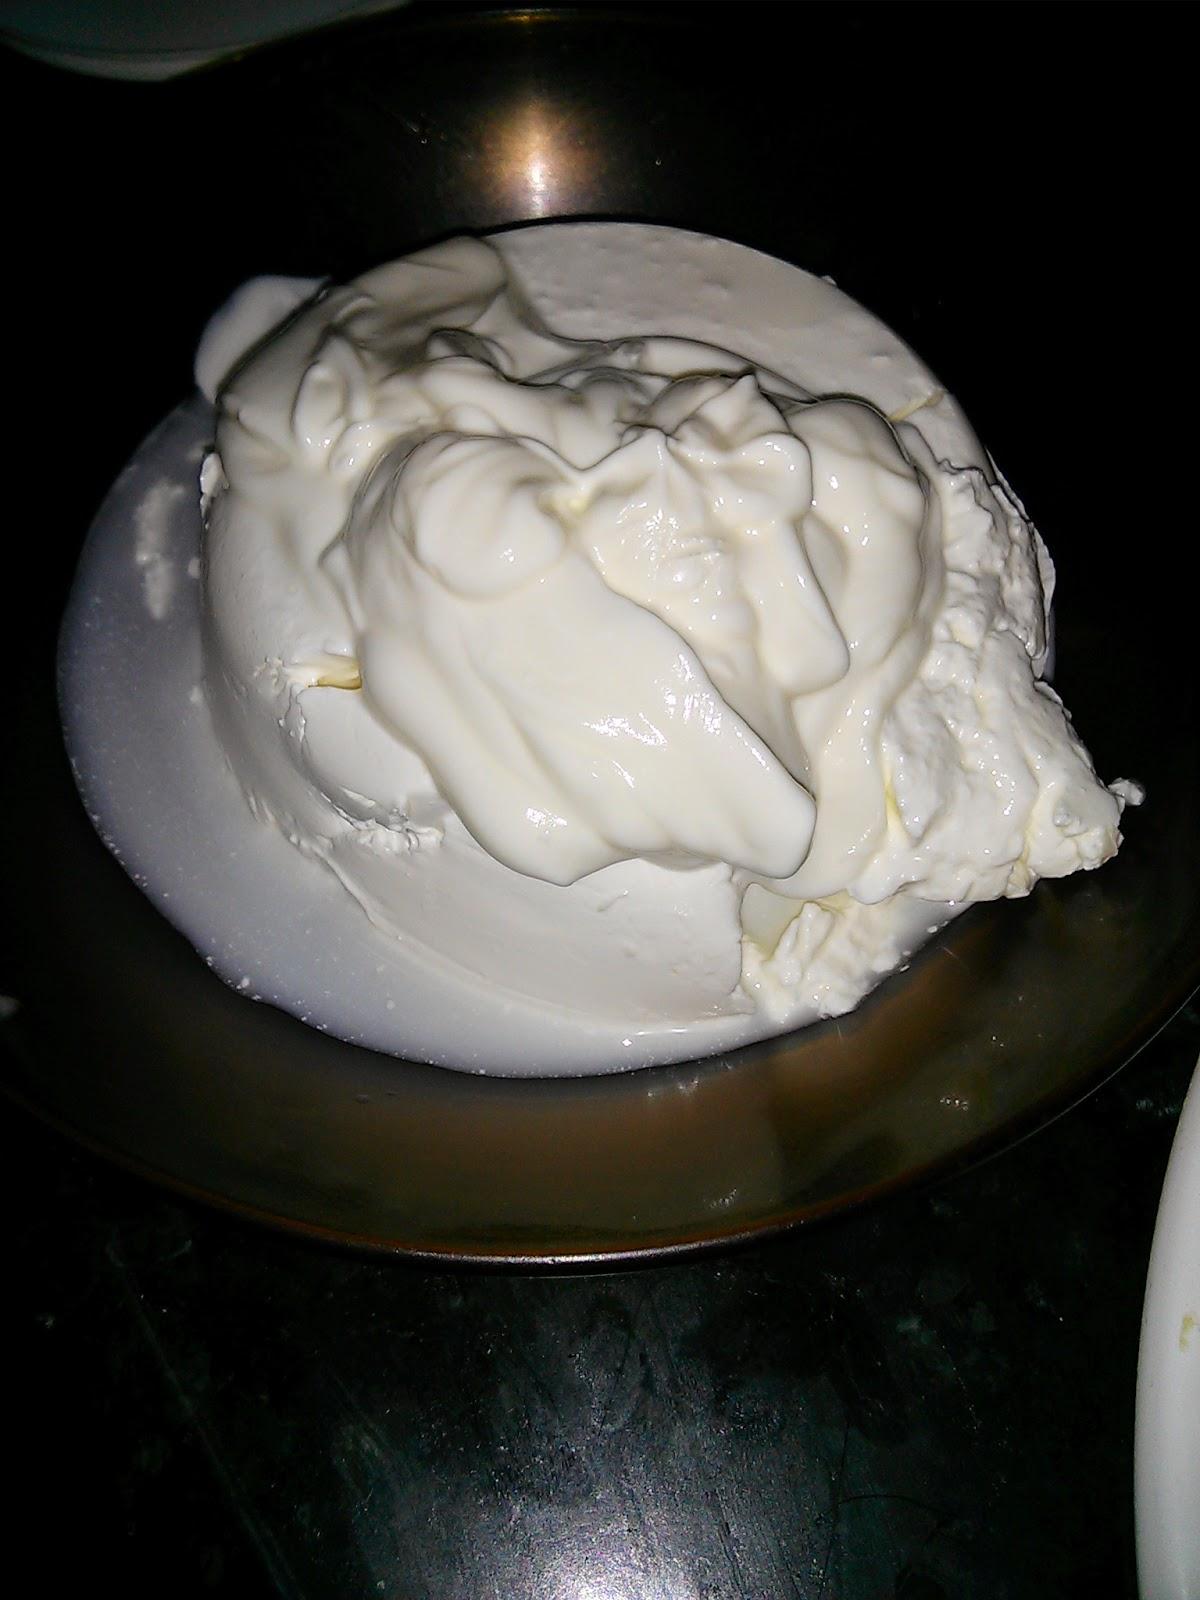 Cremoso con mermelada de melocotón